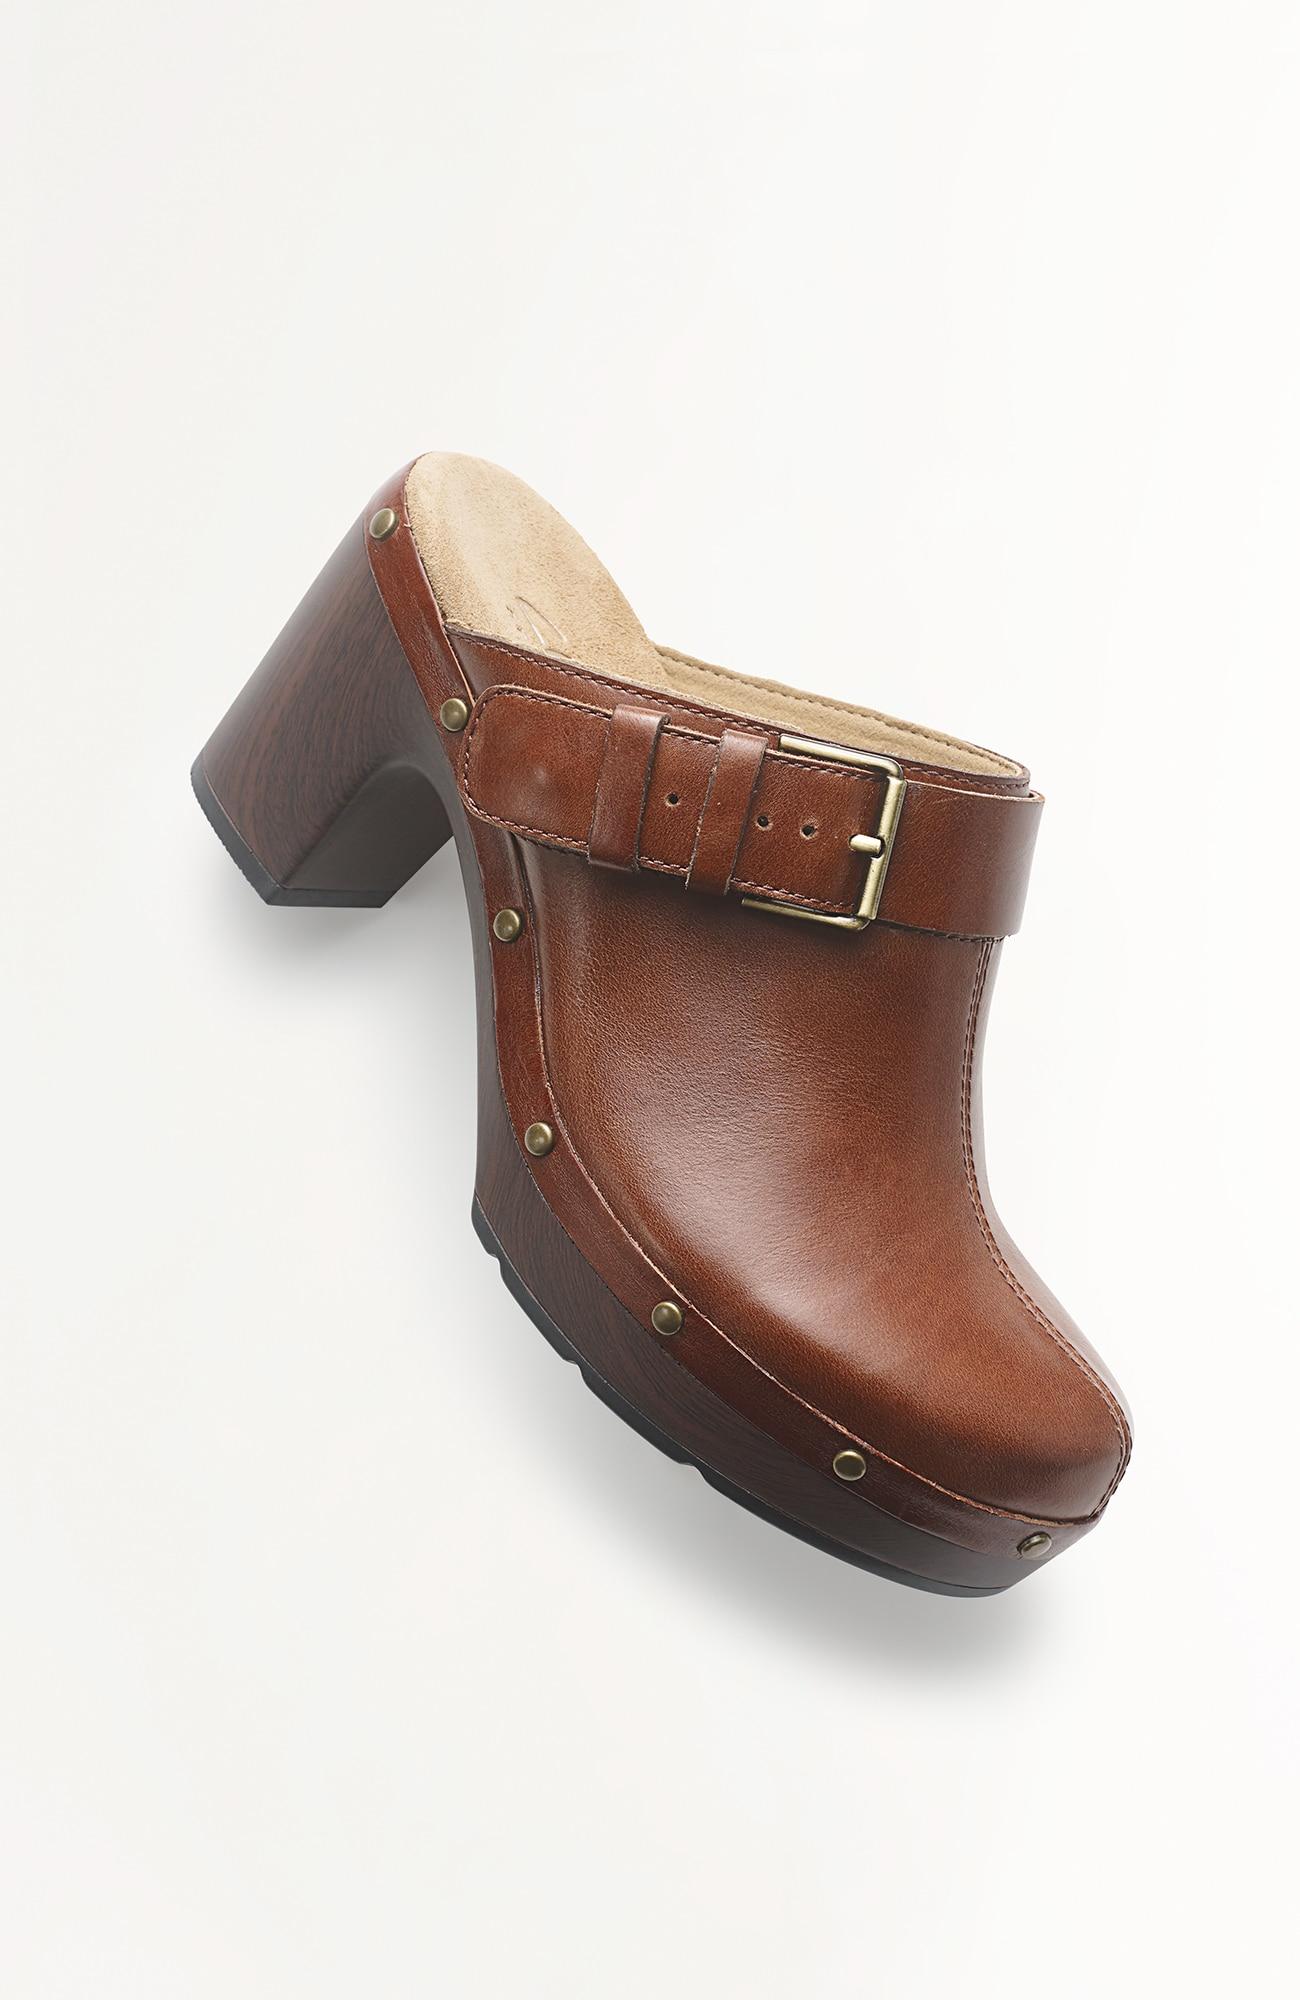 Clarks® Ledella York clogs